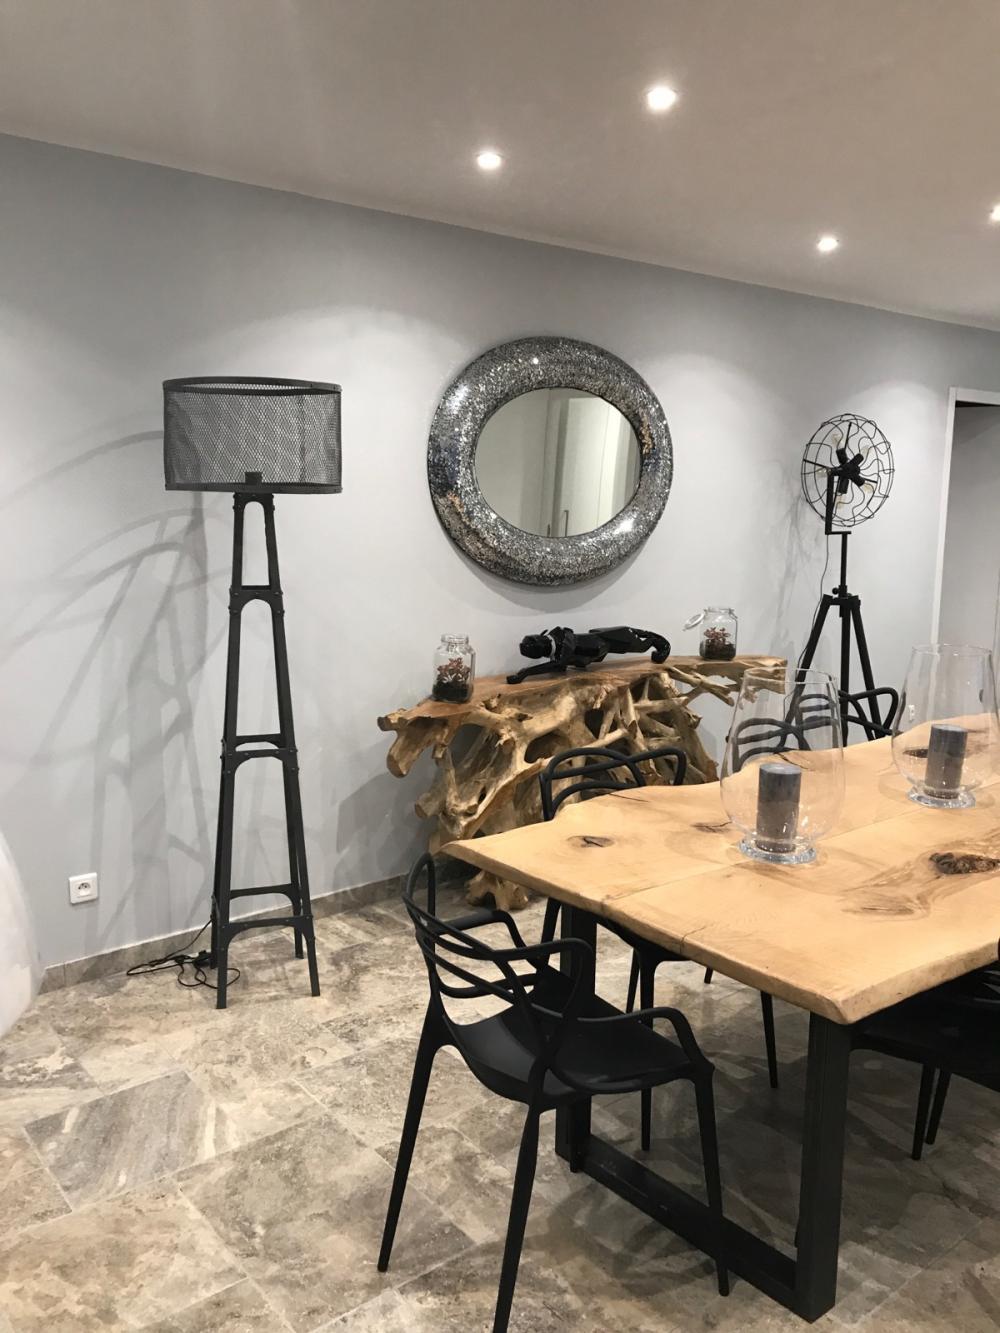 Table en chêne bords irréguliers piétements métalliques – 1800.00€